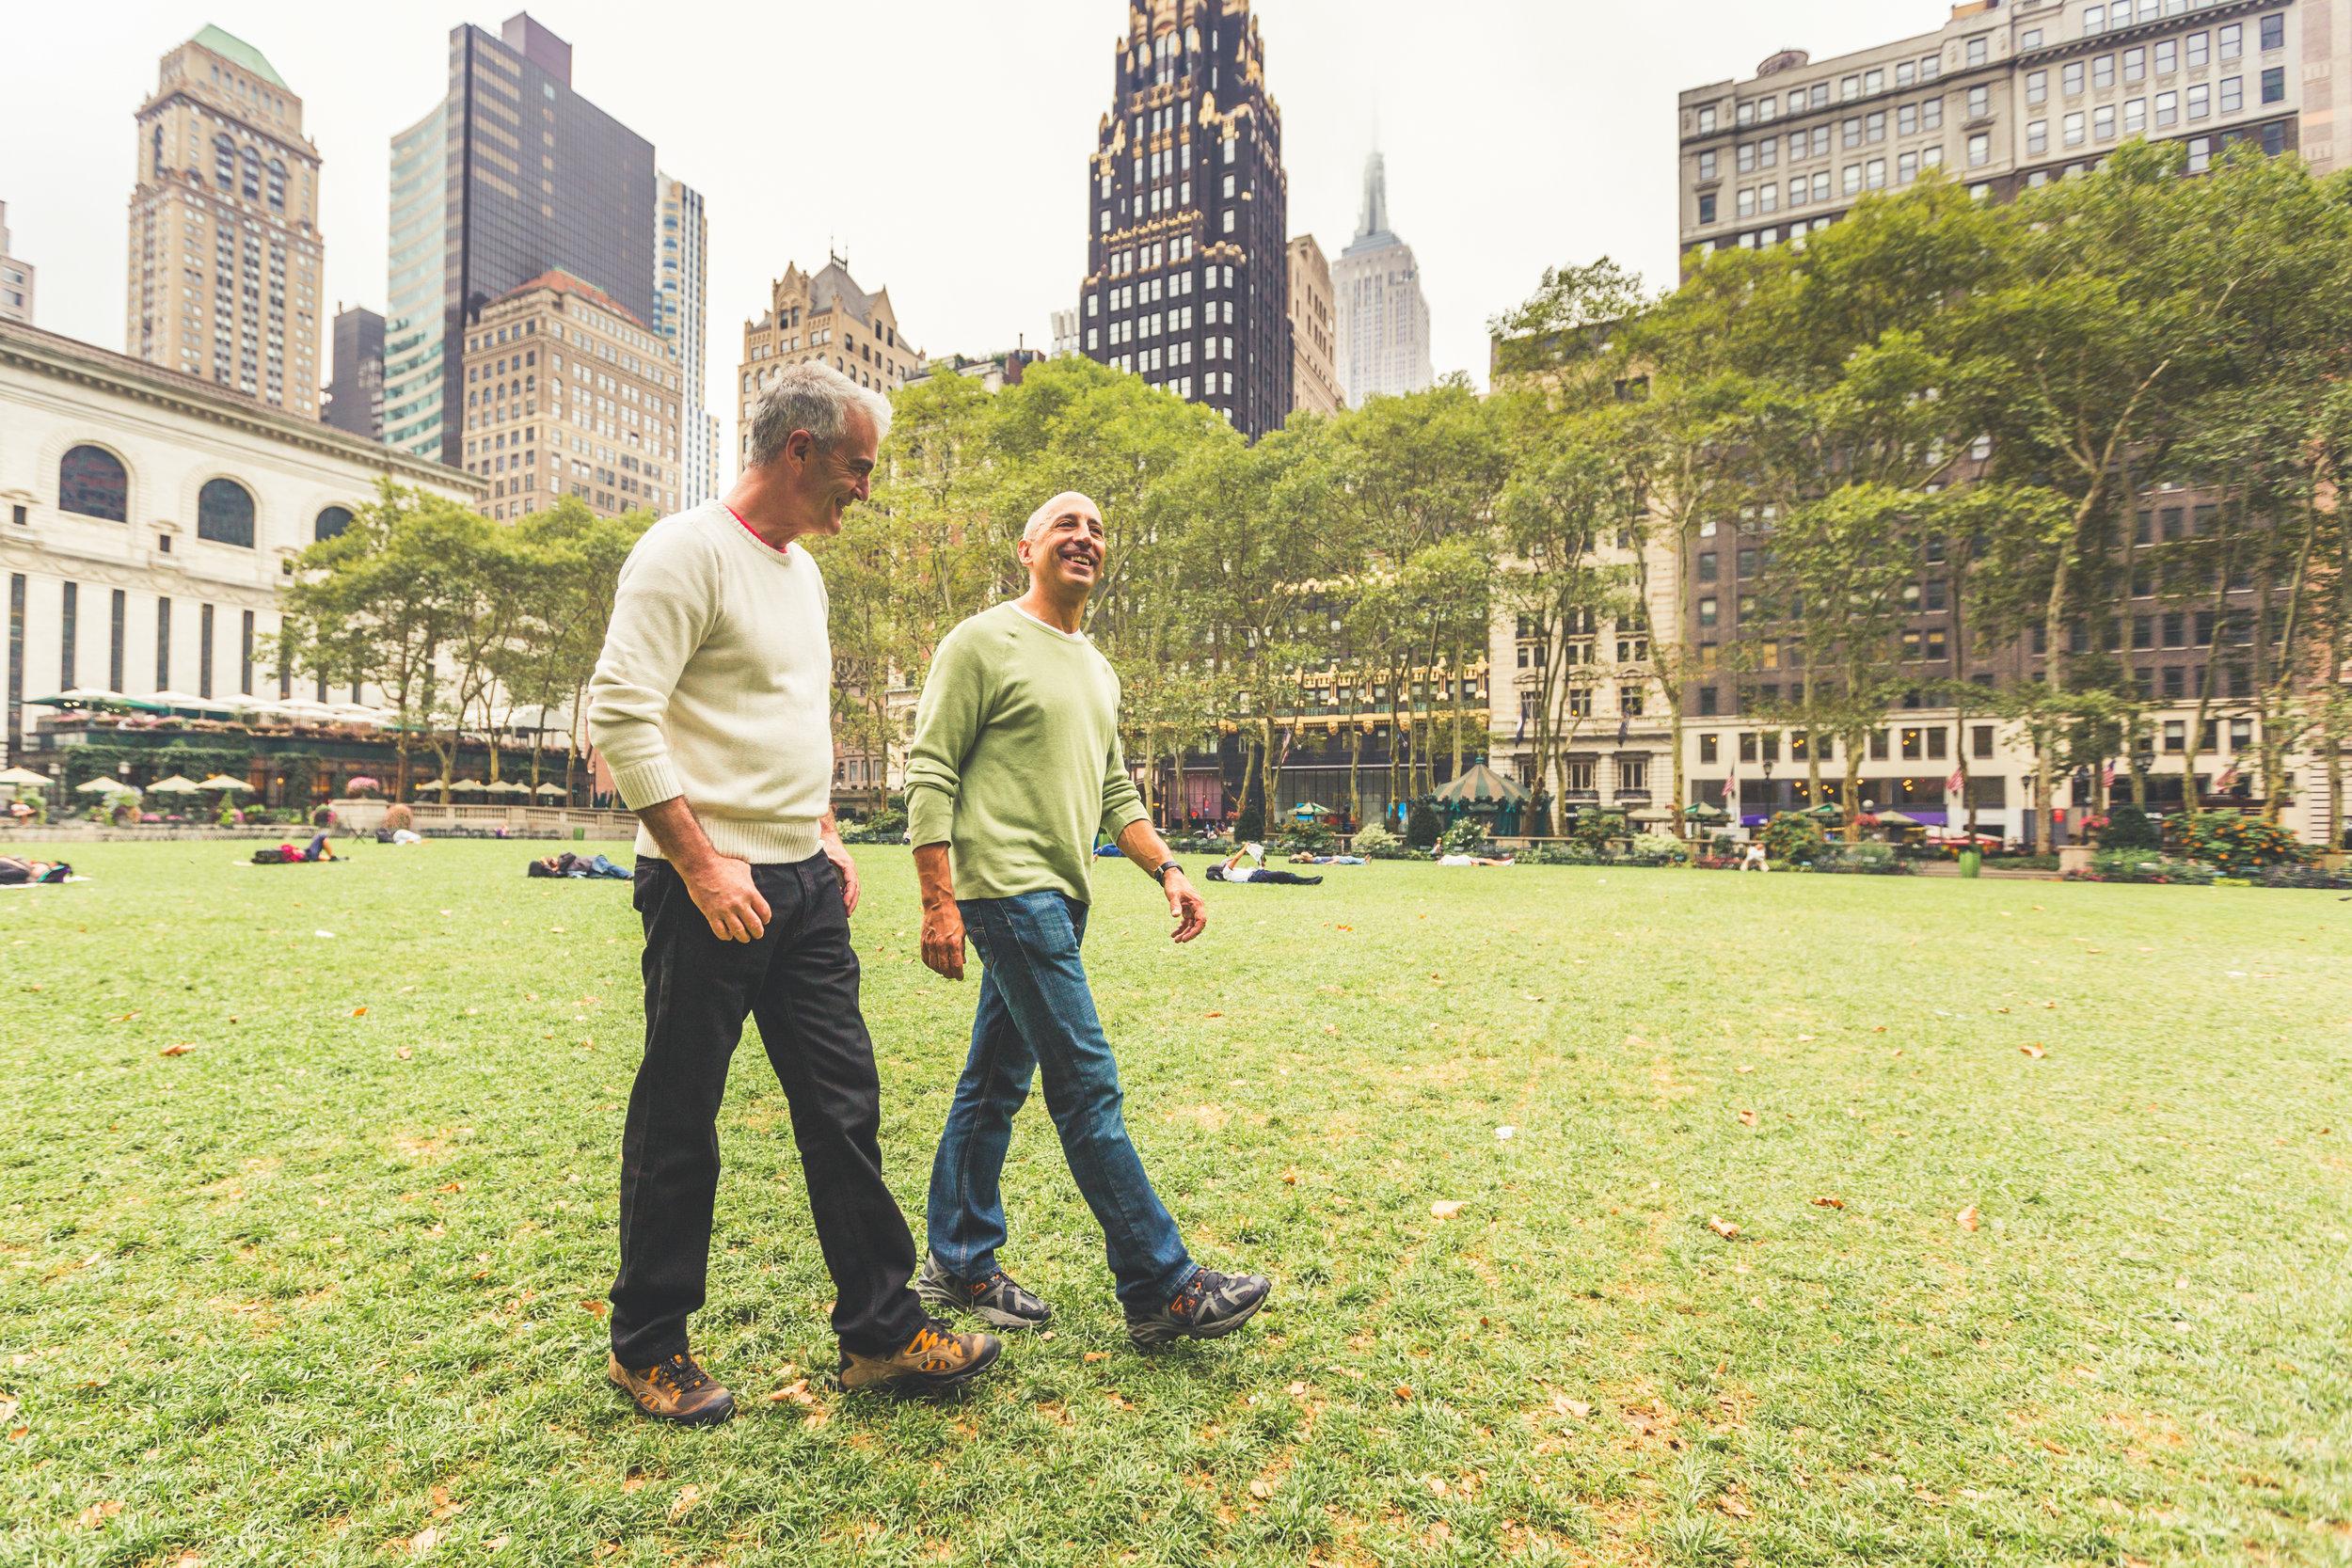 sharing memories in new york city